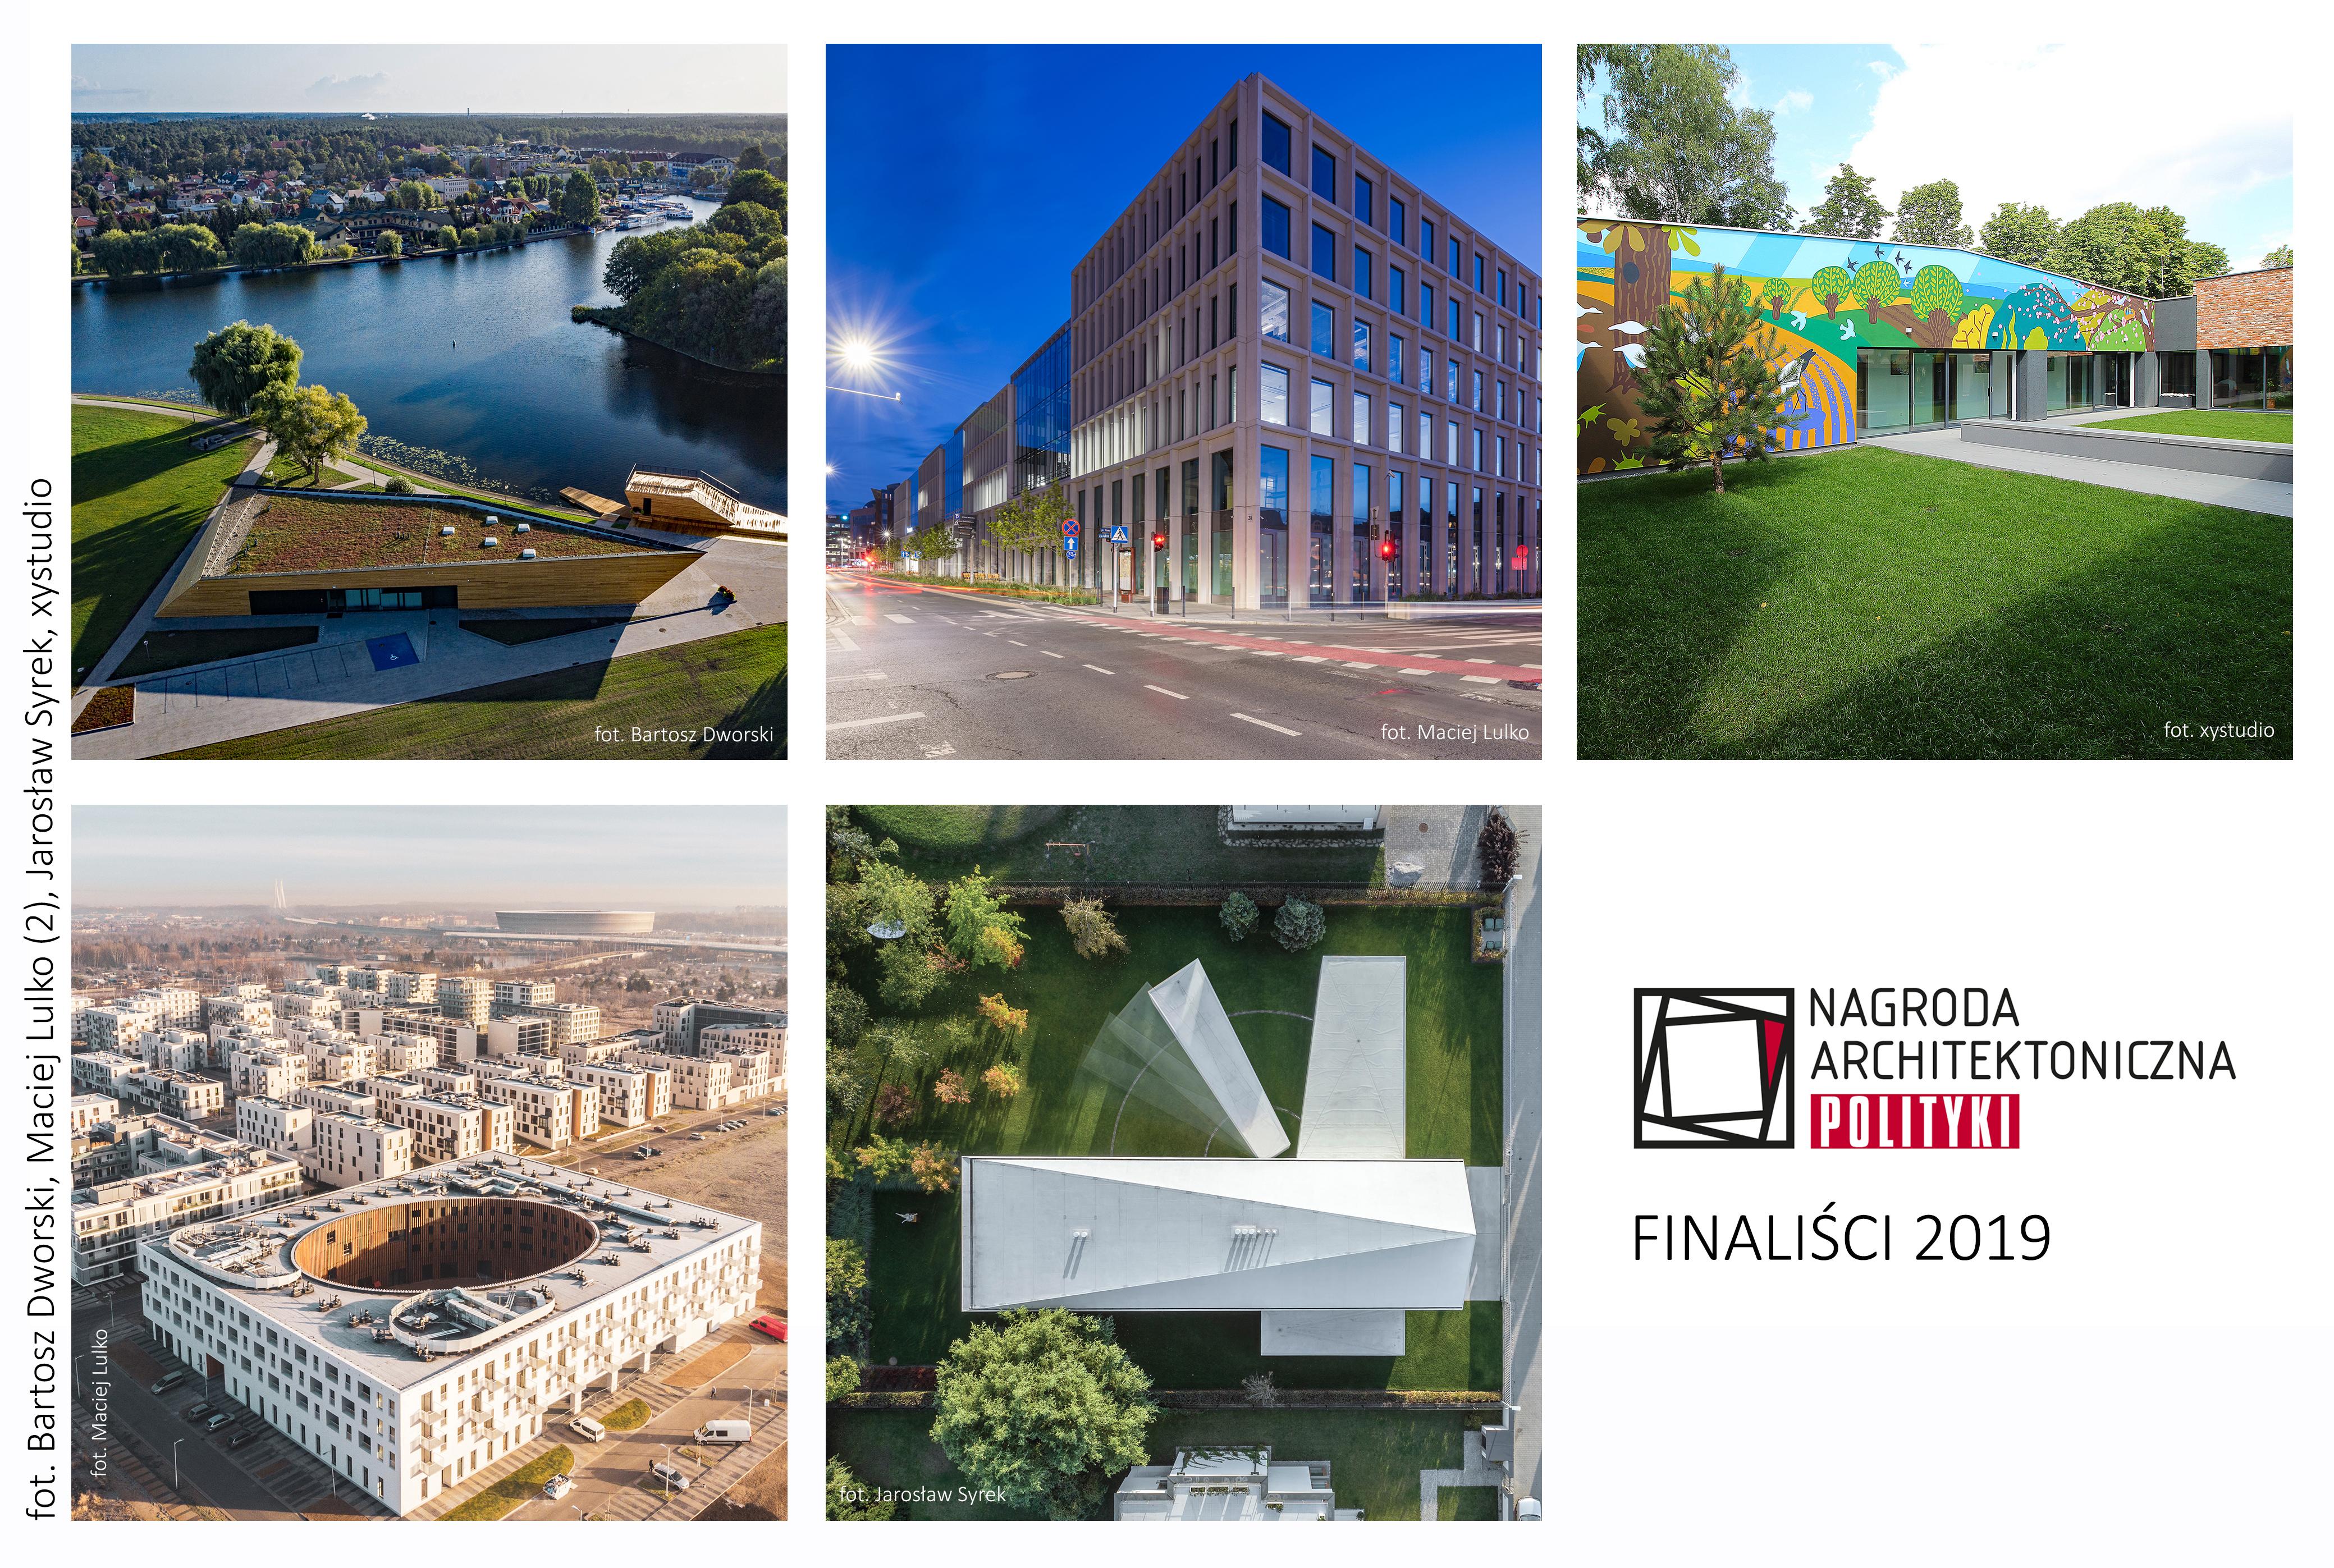 Nagroda Architektoniczna POLITYKI_FINALISCI_2019